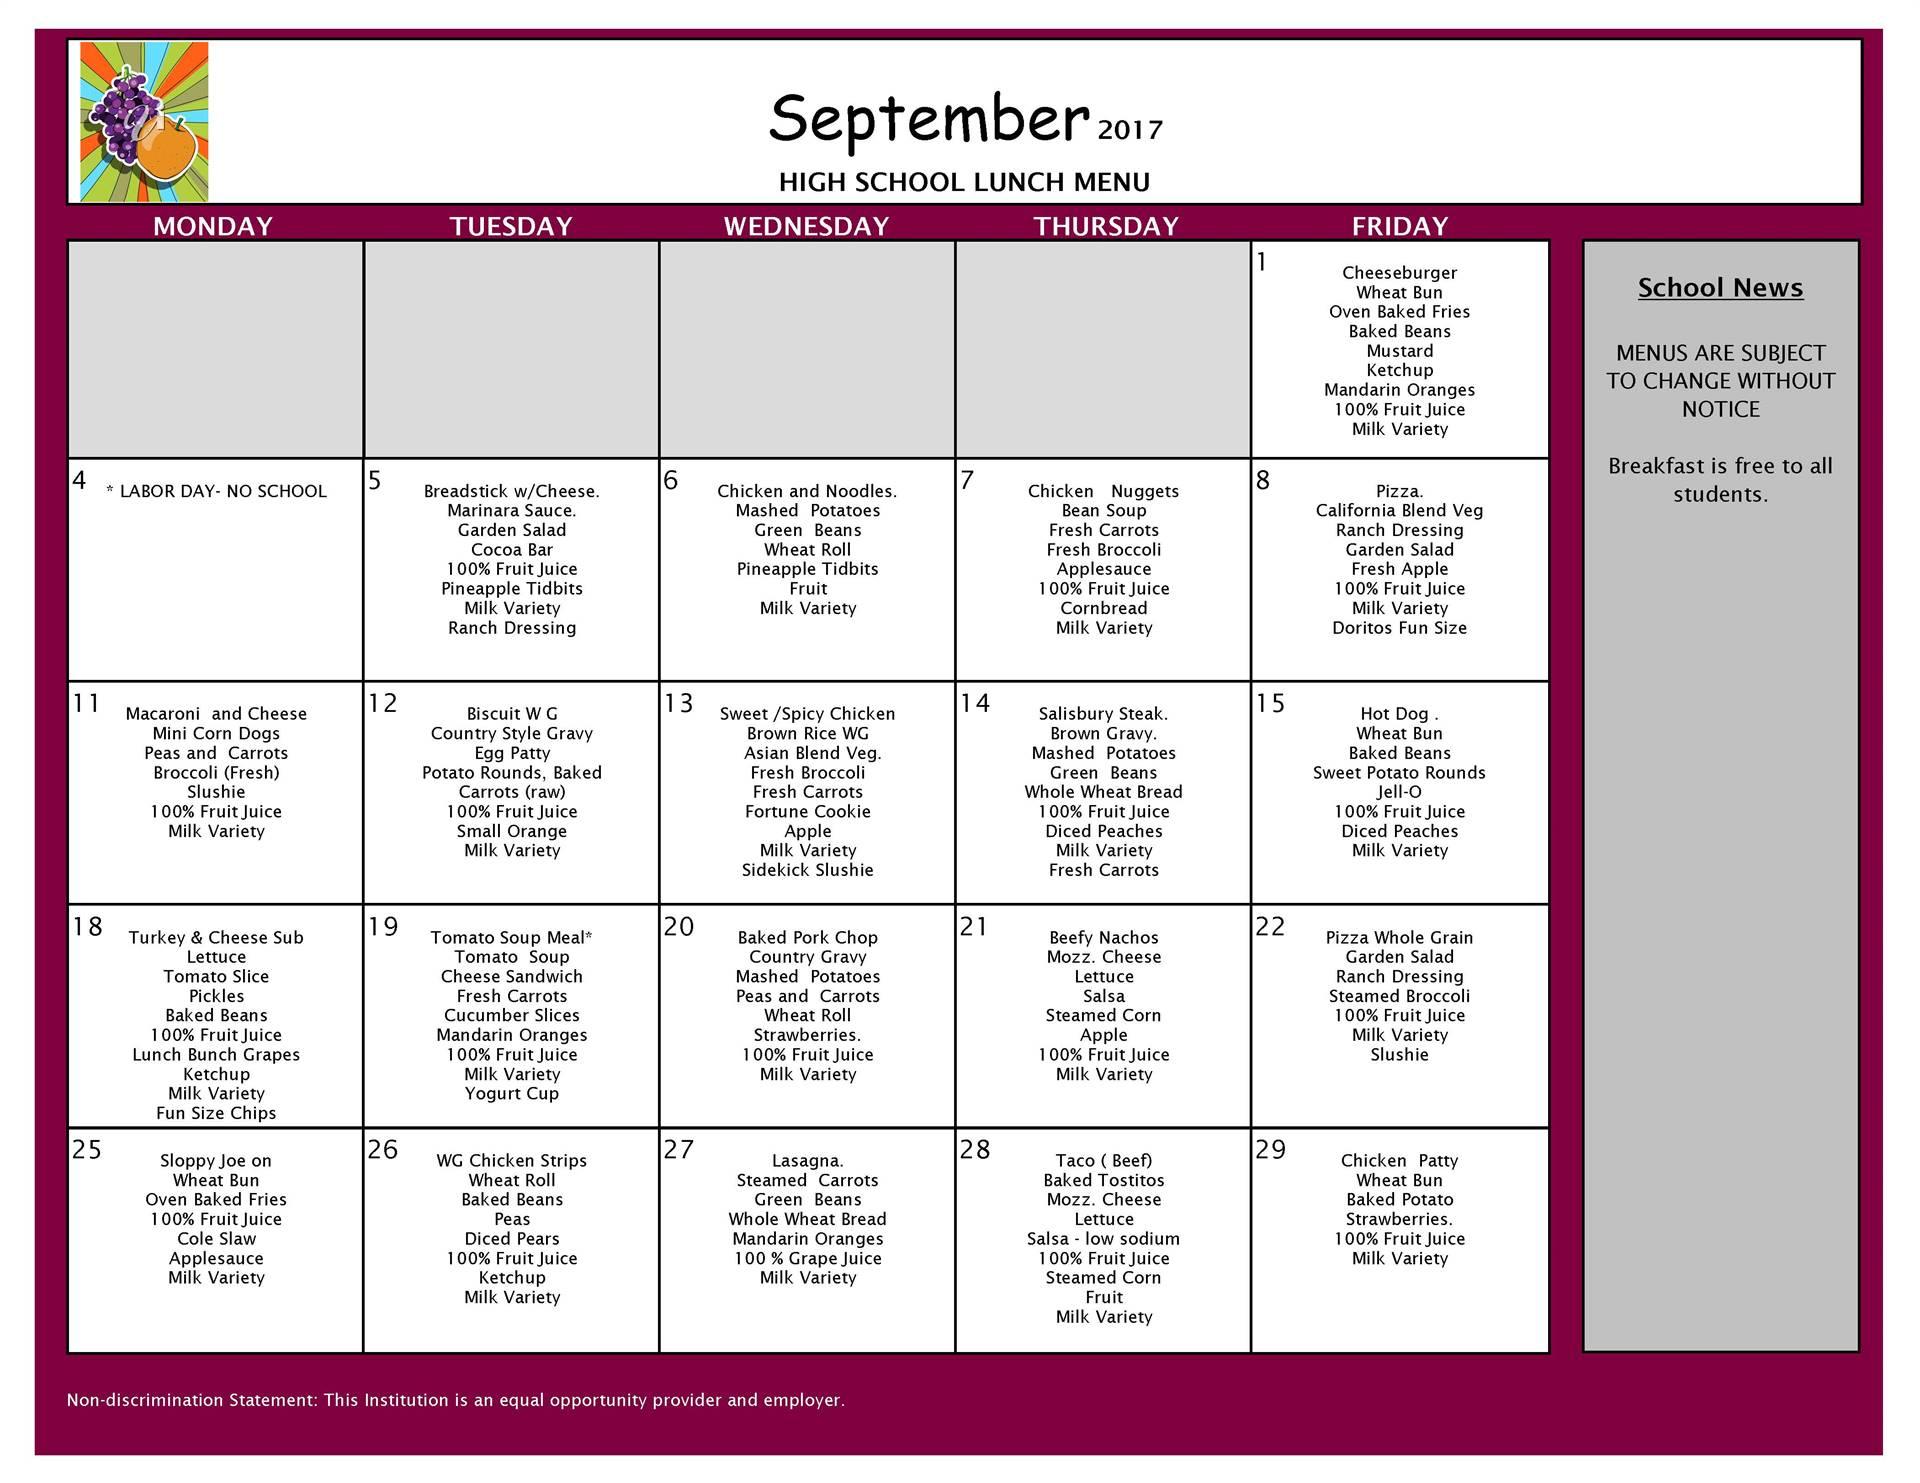 September Lunch - High School